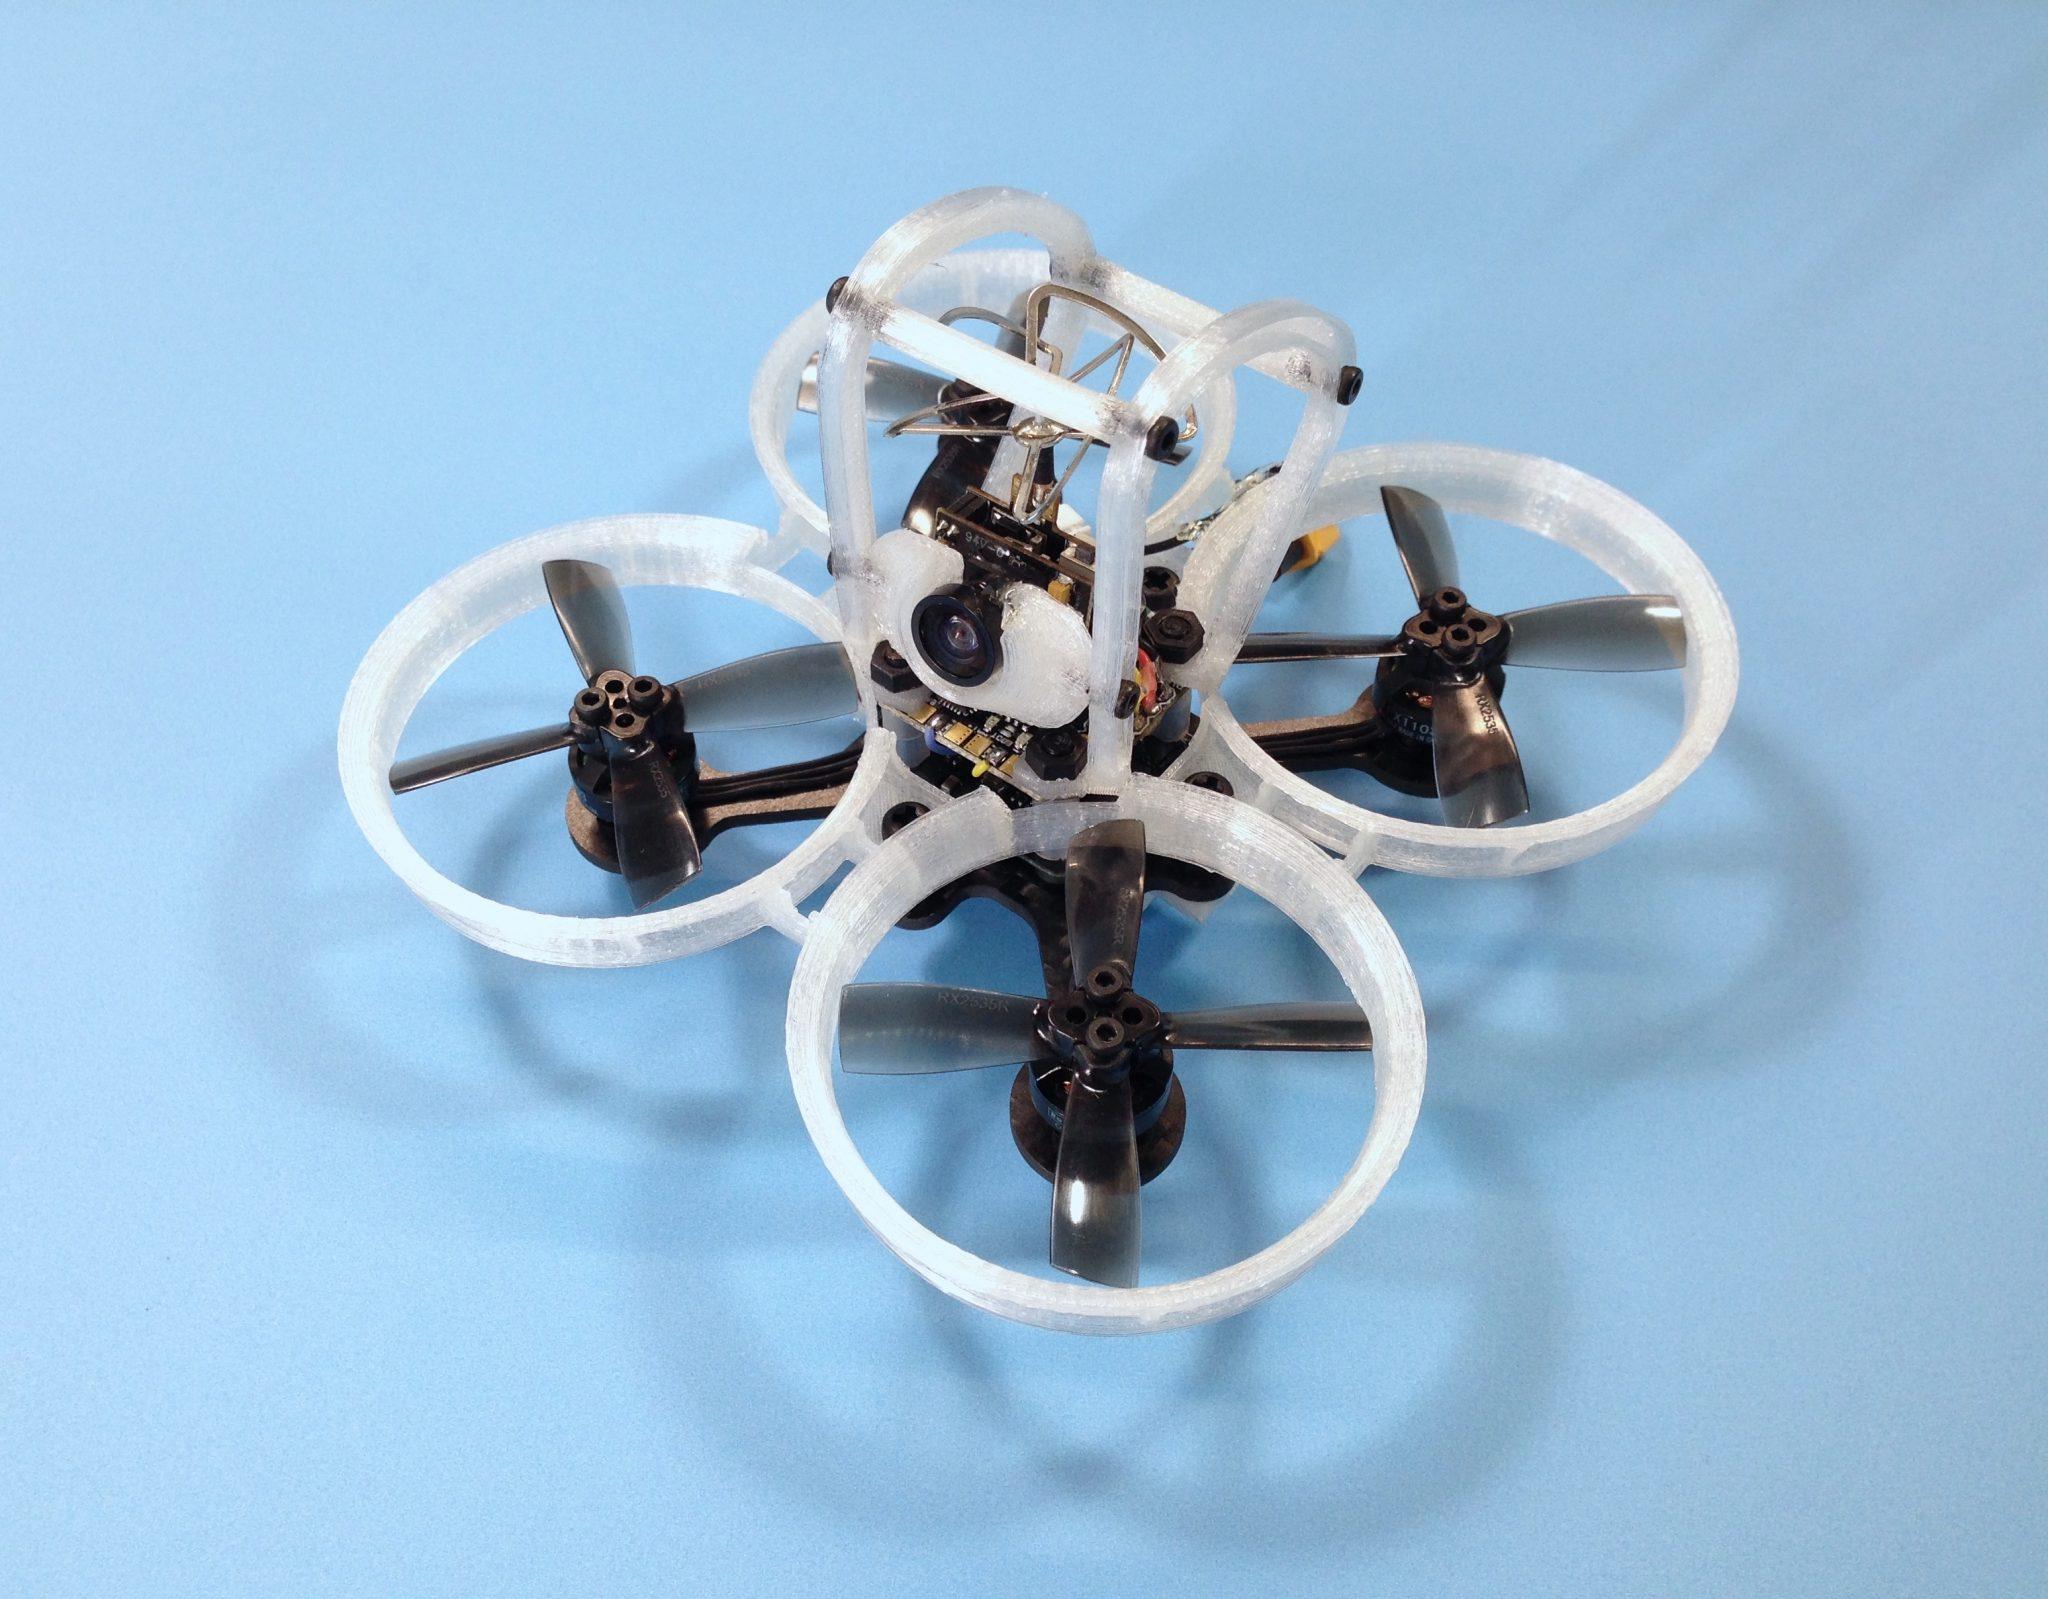 Pico Owl V2 - Safest Indoor Proximity FPV Racing Drone Frame